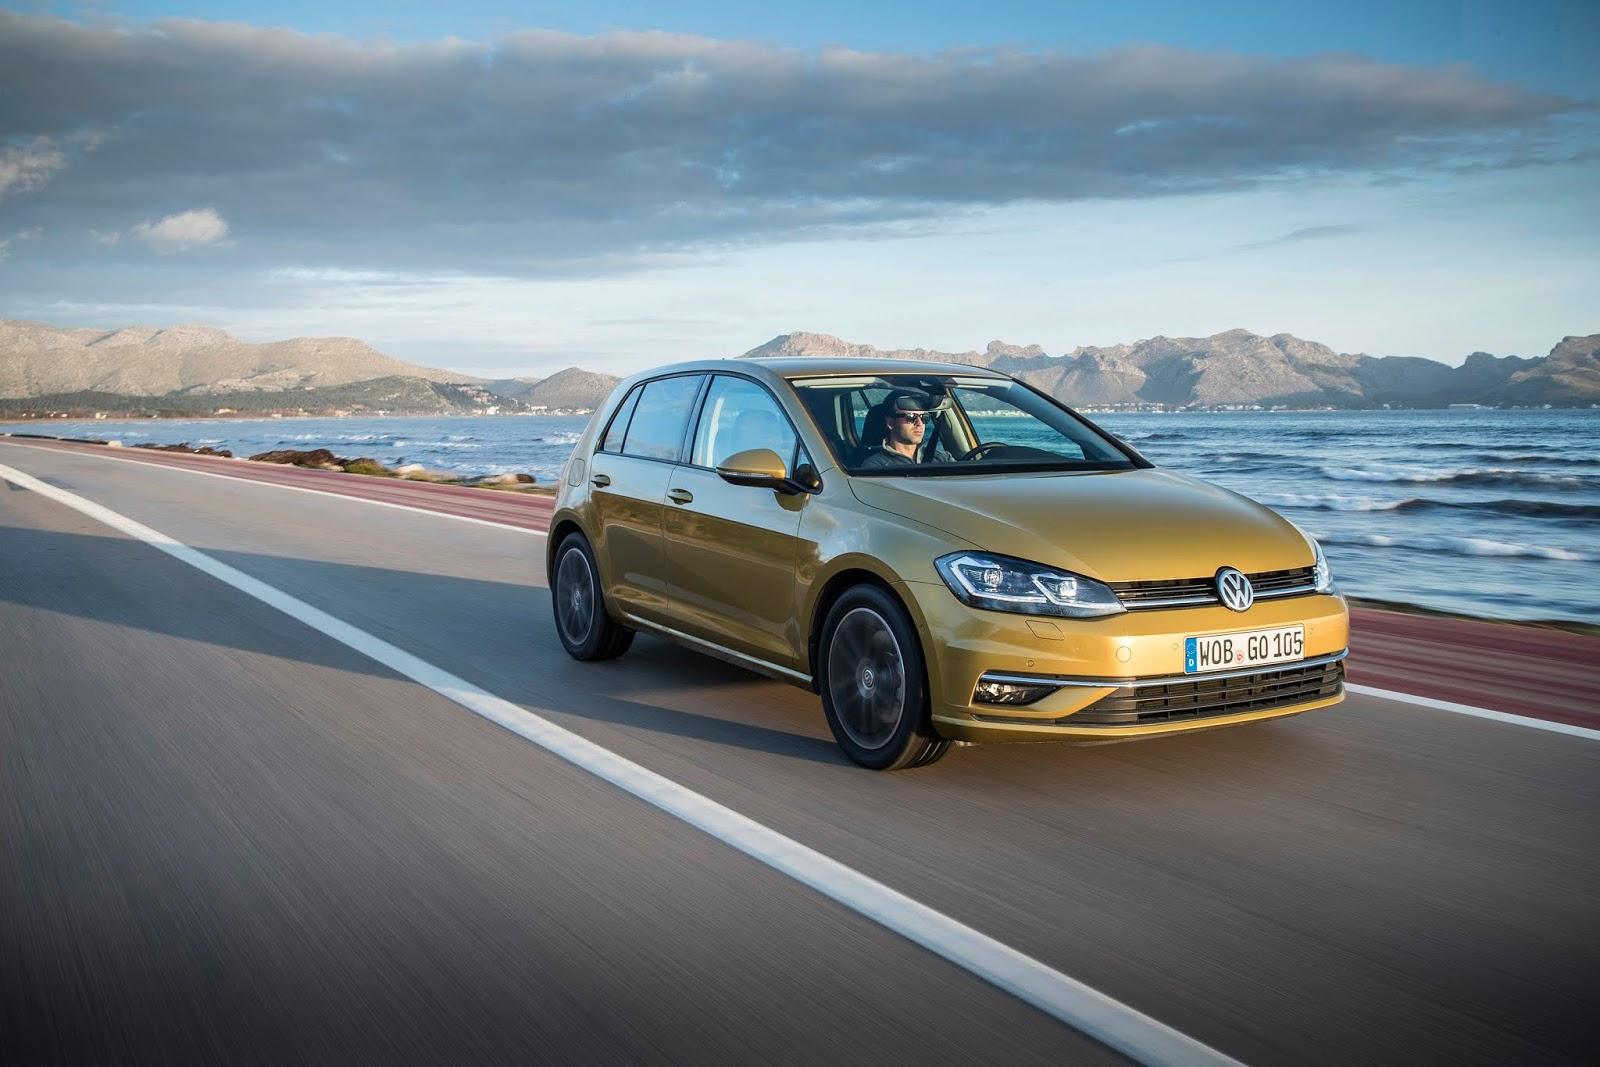 VOLKSWAGEN2BGOLF Deal Days με όφελος ως 4.000 ευρώ από τη Volkswagen! Kosmocar, Volkswagen, VW, αγορά, καινούρια, Καρέντα, προσφορές, τιμες